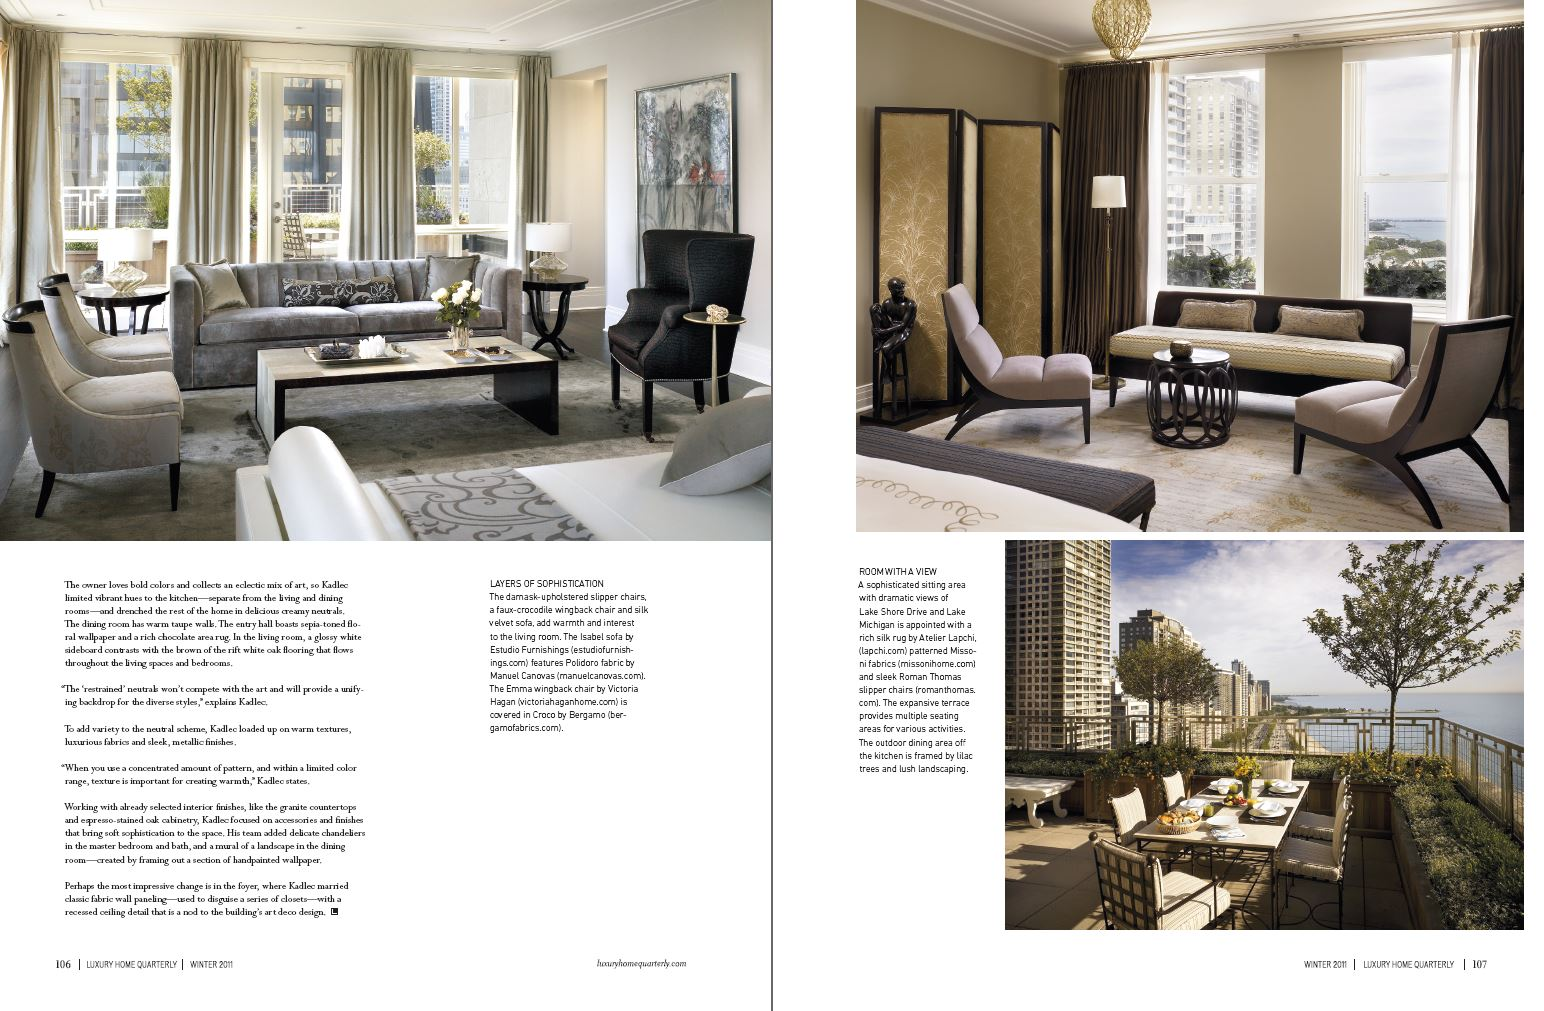 LHQ Content - Winter 2011 - Urban Terrace Residence 3.JPG